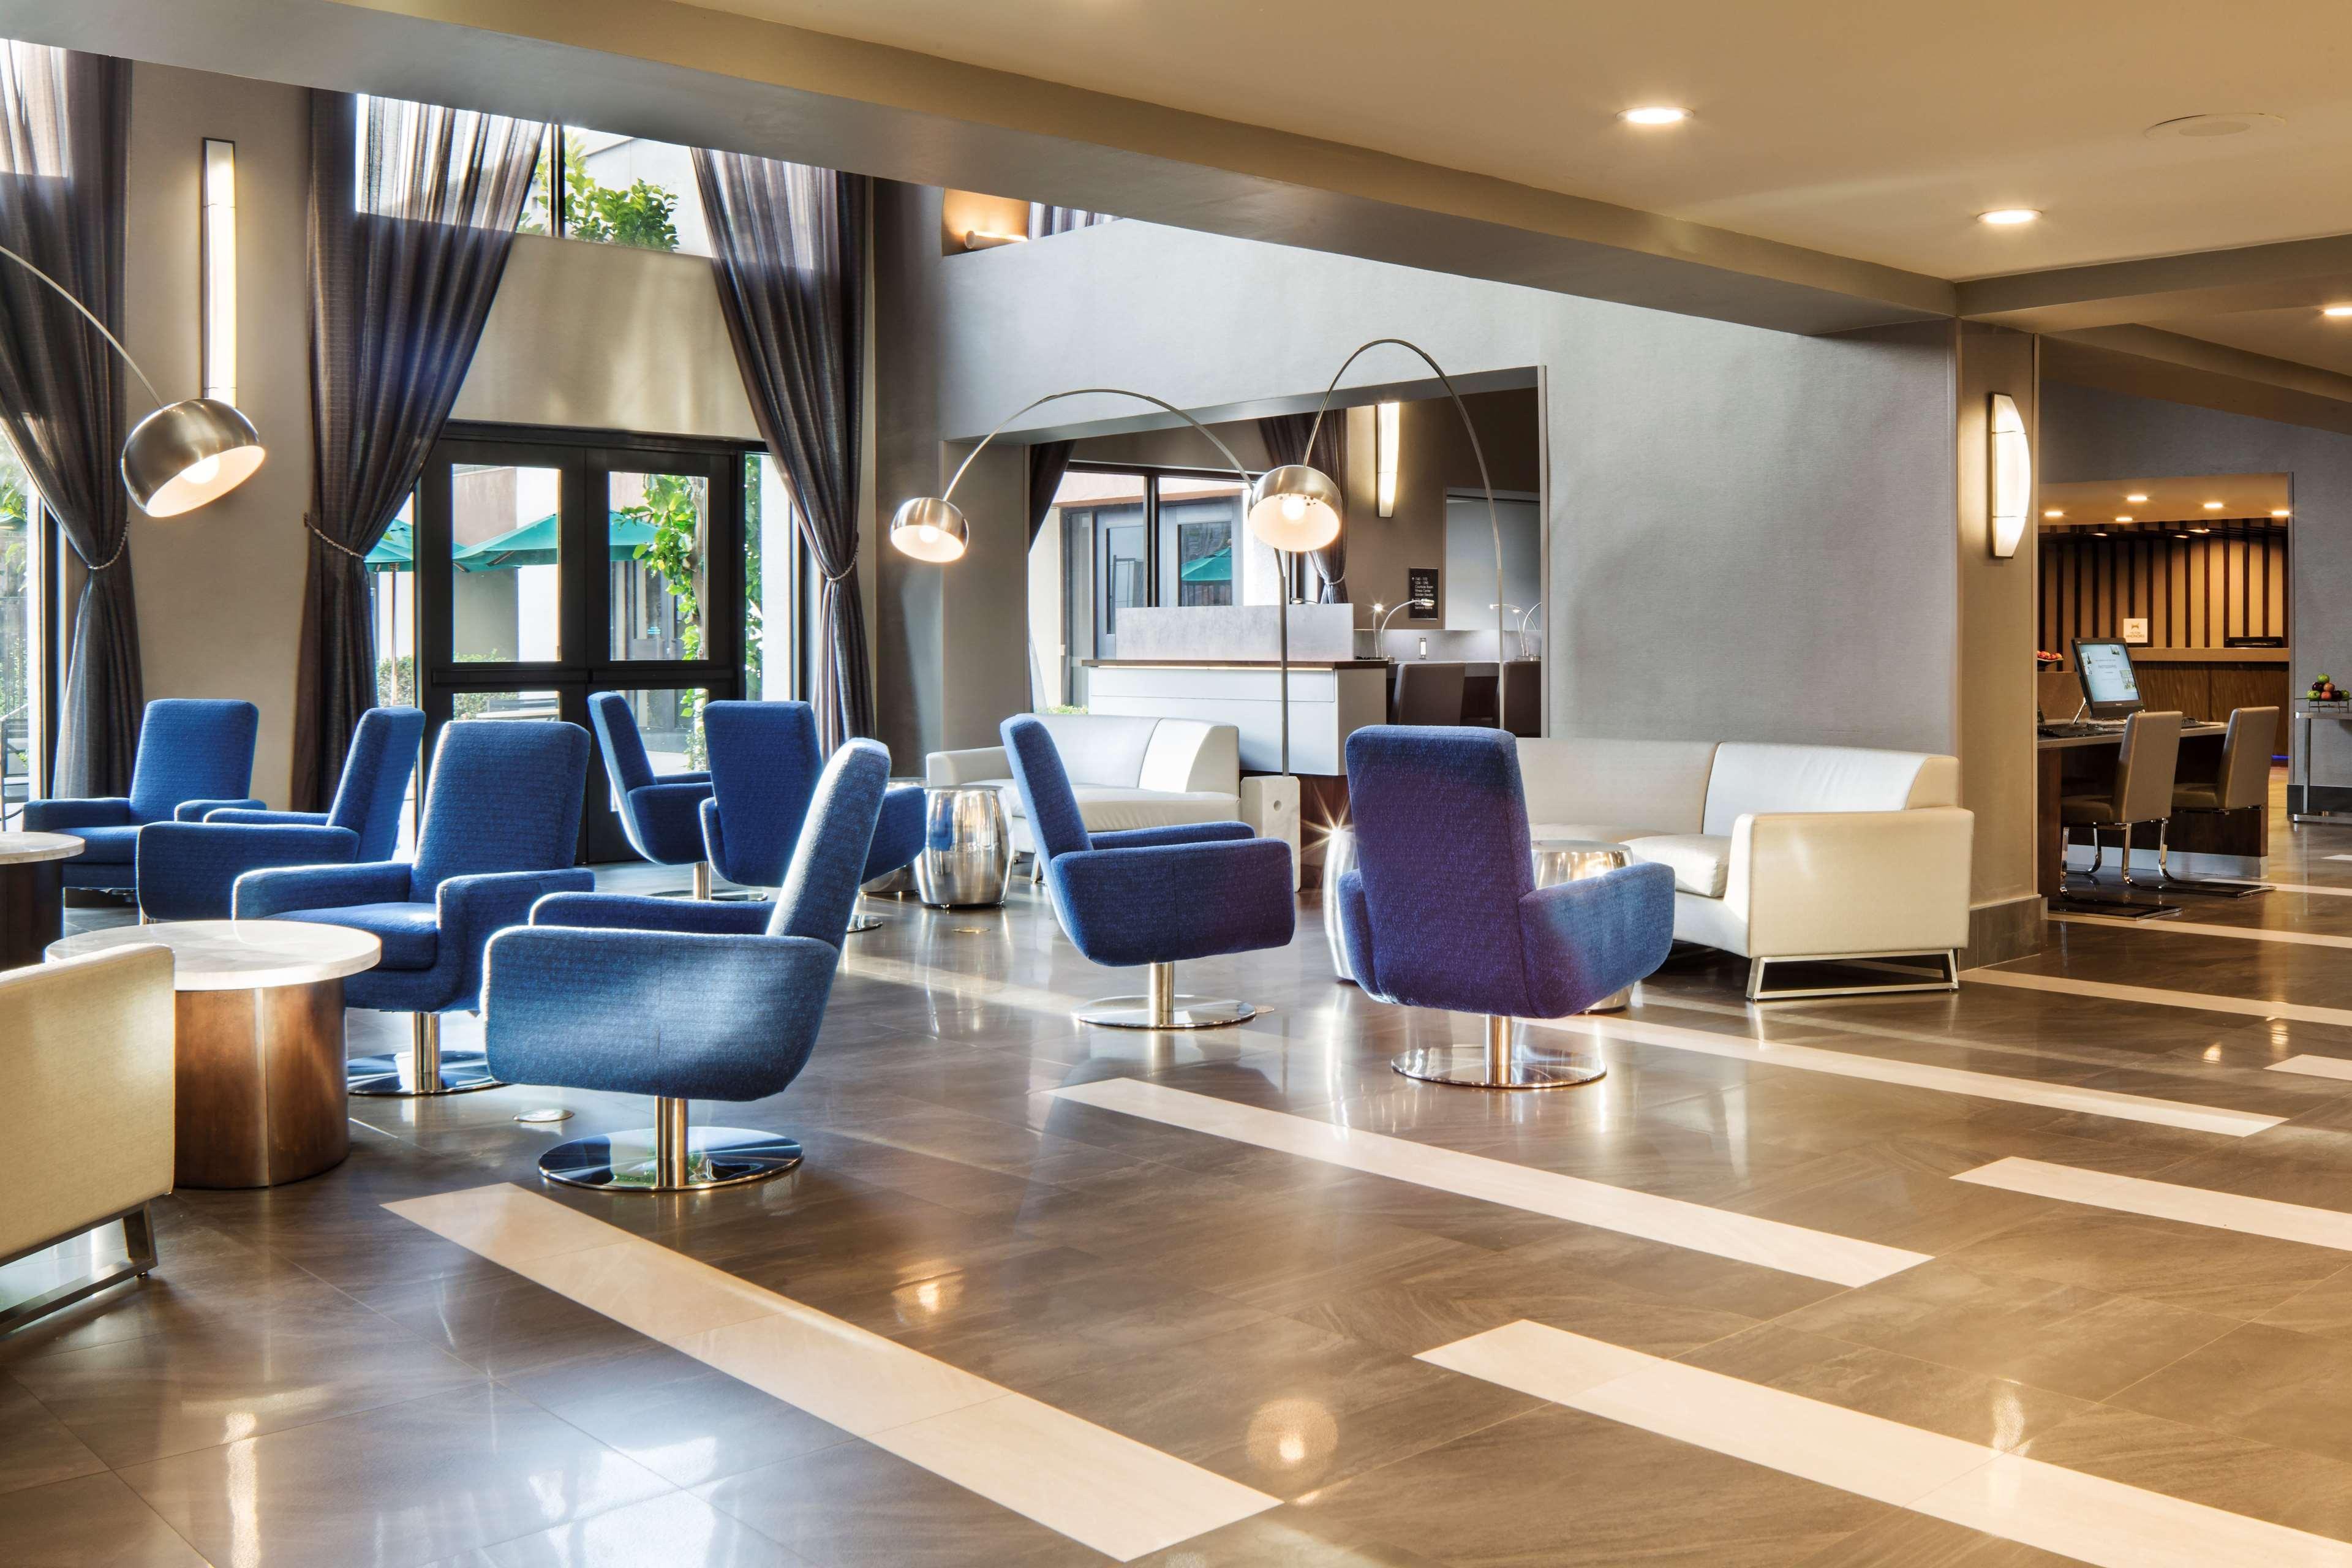 DoubleTree by Hilton Hotel Newark - Fremont image 5